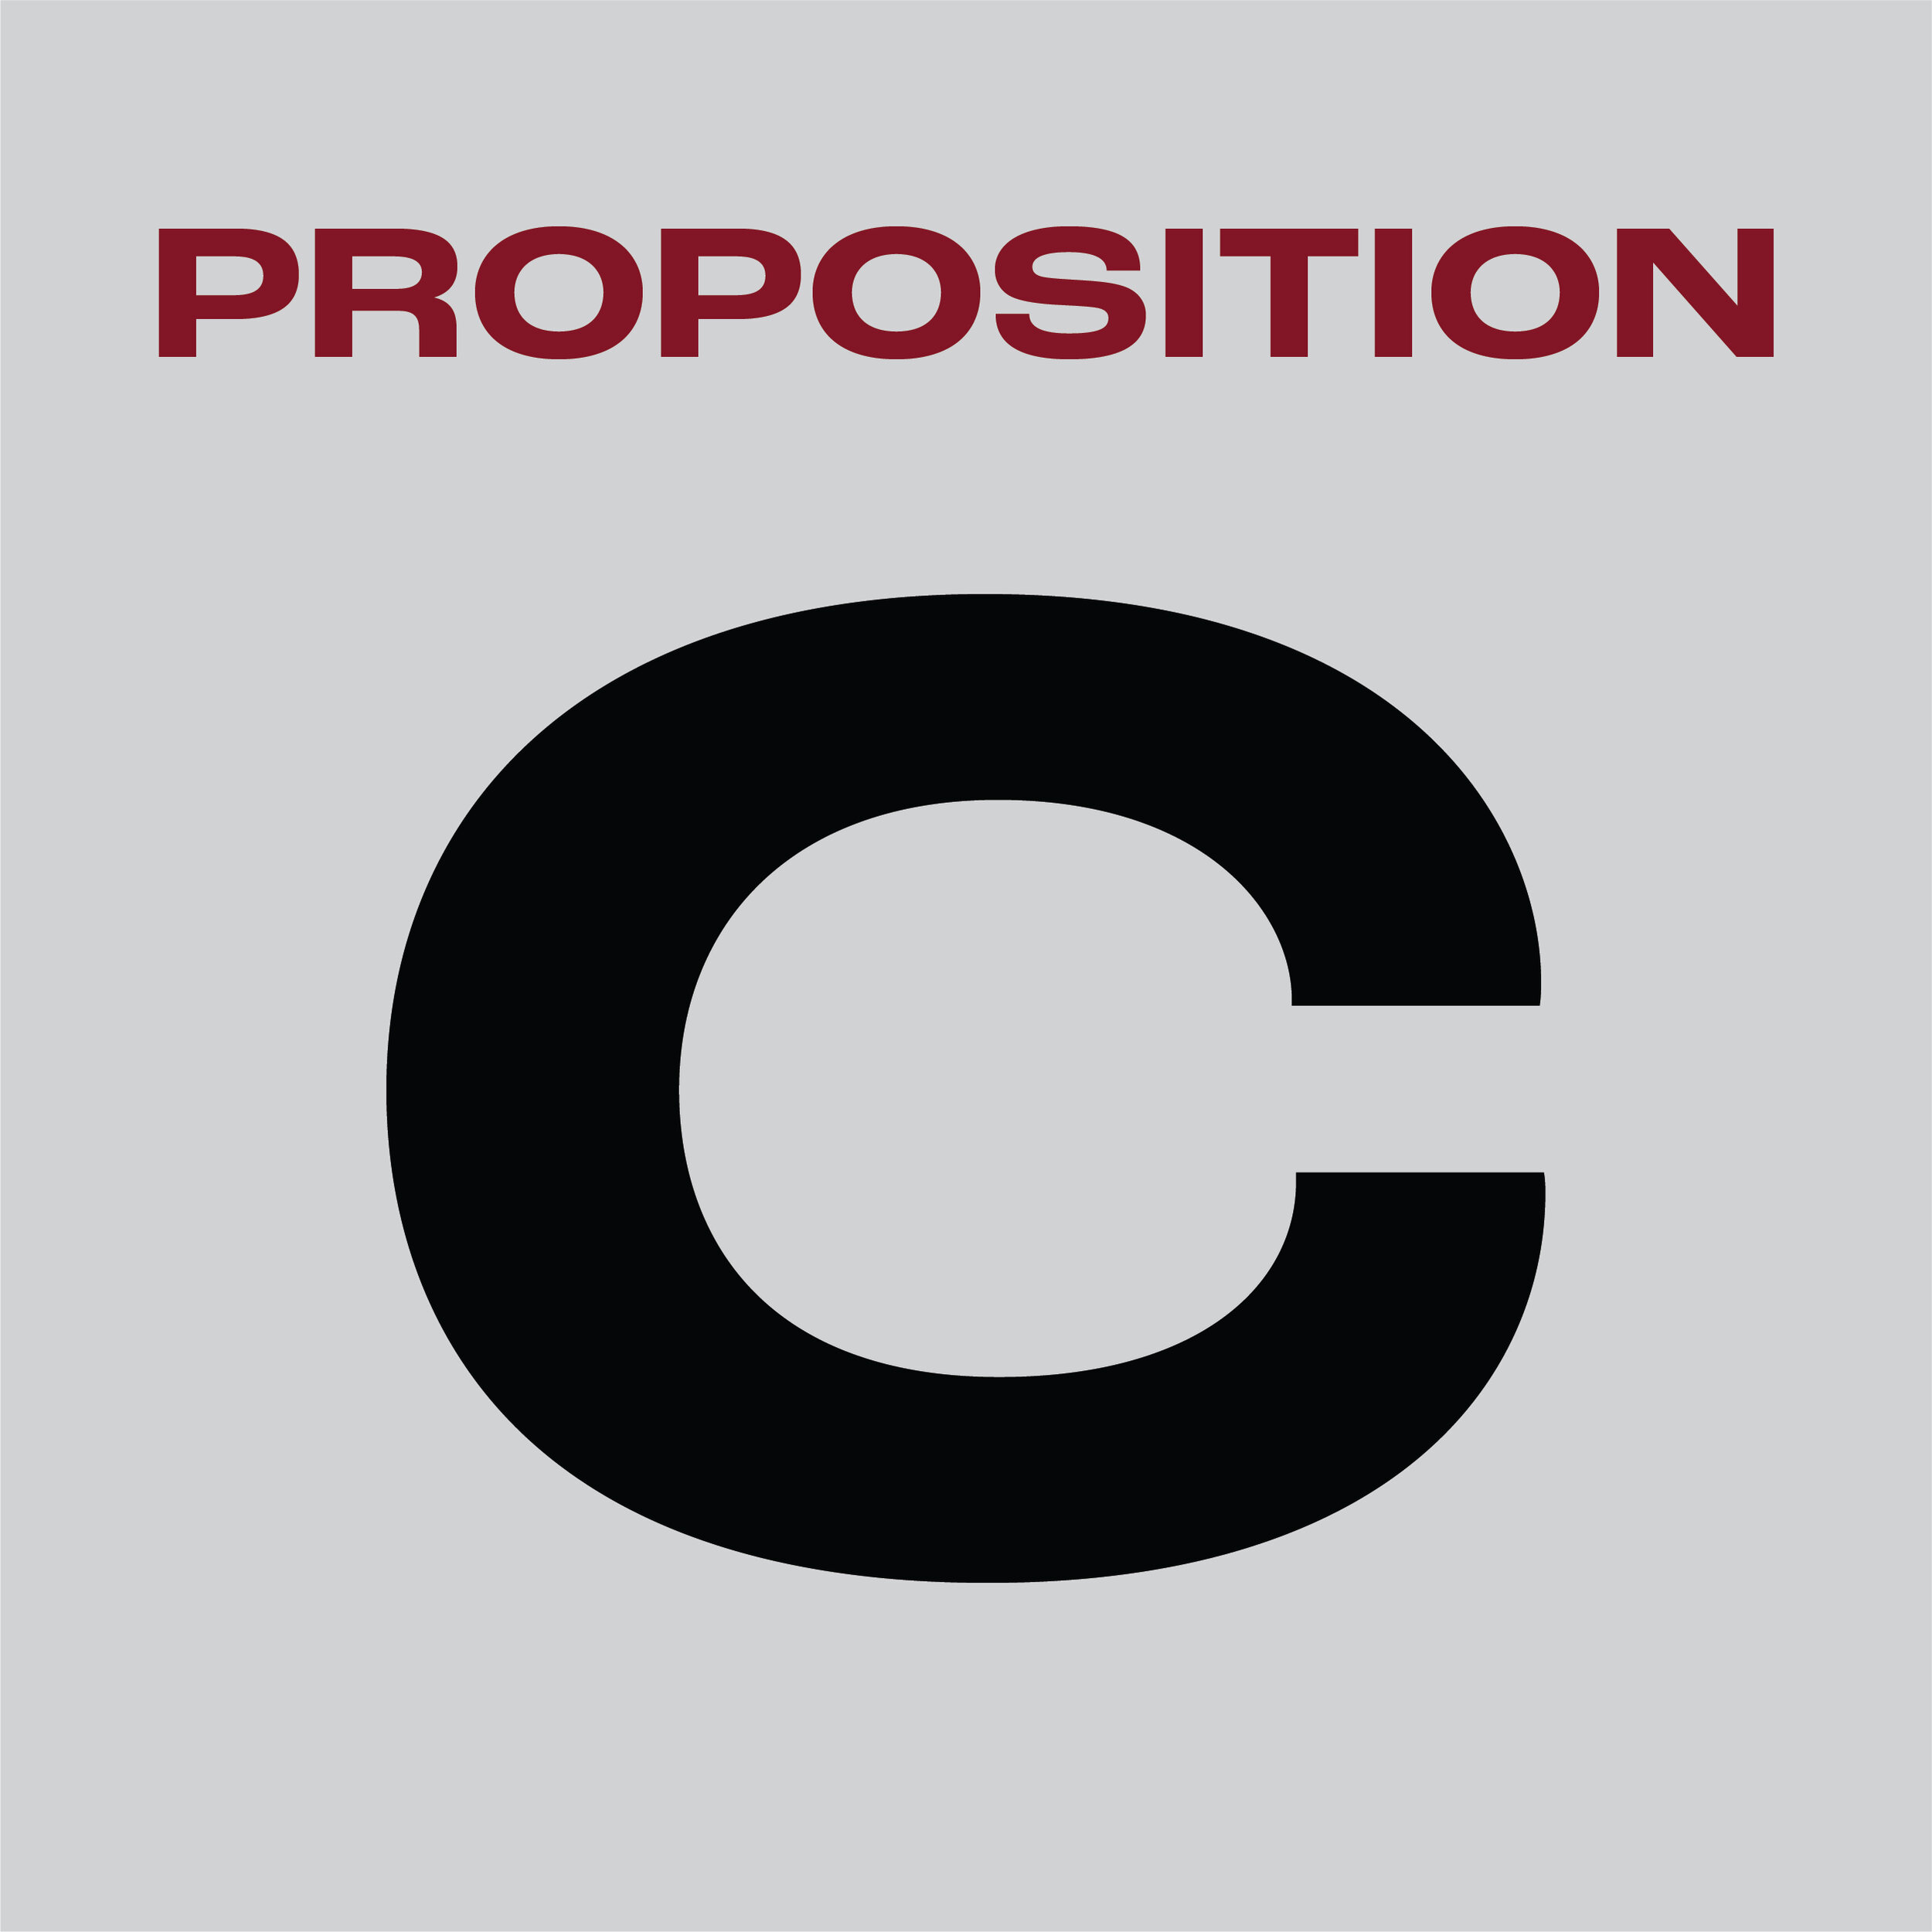 Ballot Propositions Northwest Isd Bond 2020